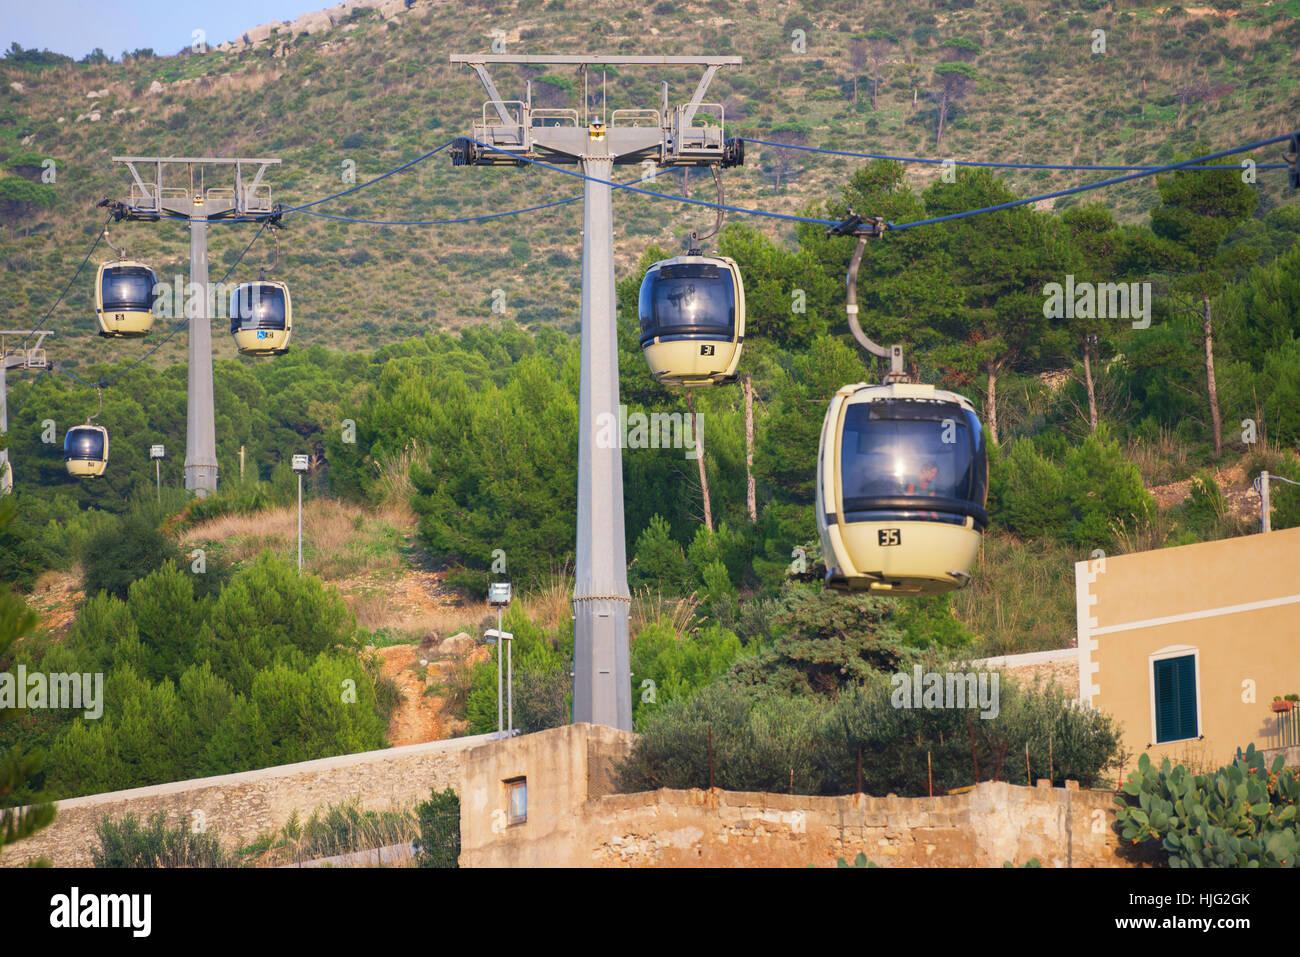 Trapani-Erice cableway, Trapani, Sicily, Italy - Stock Image